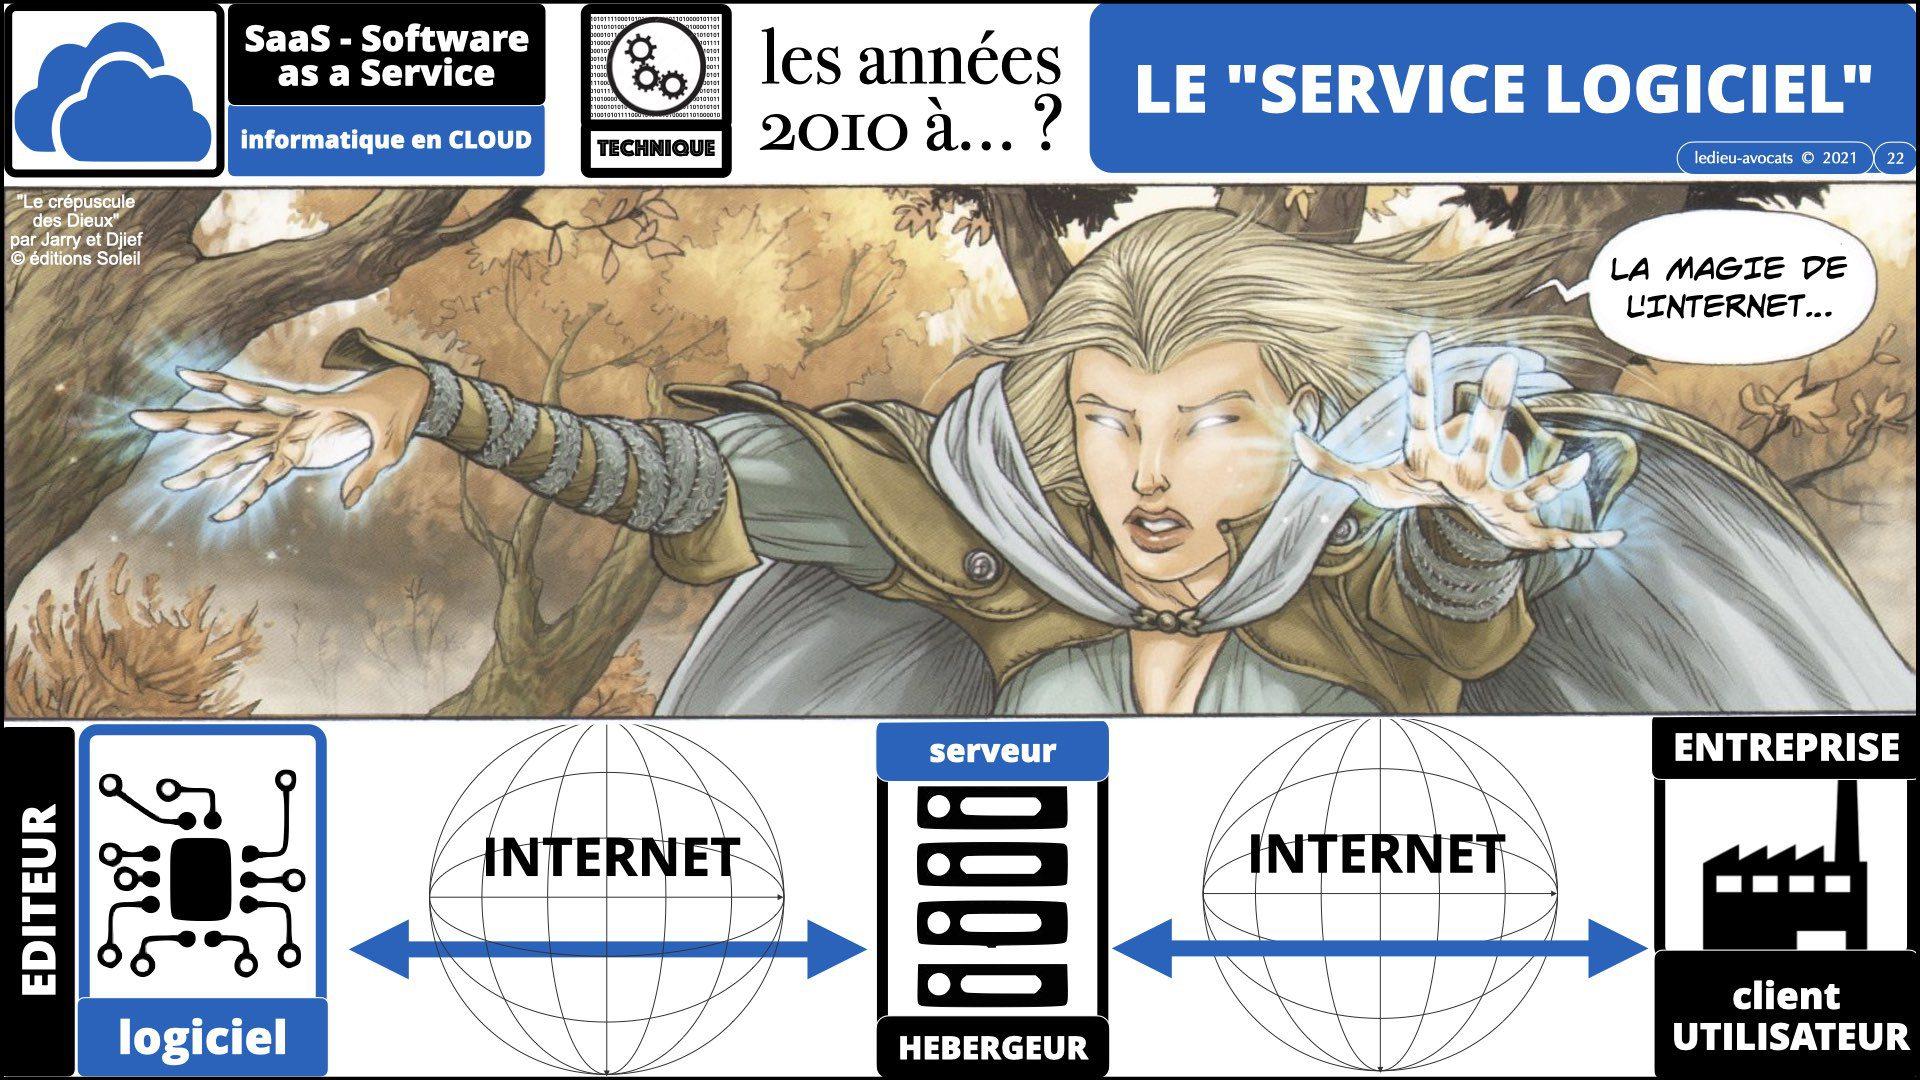 service logiciel SaaS 2021 : depuis 2010 environ